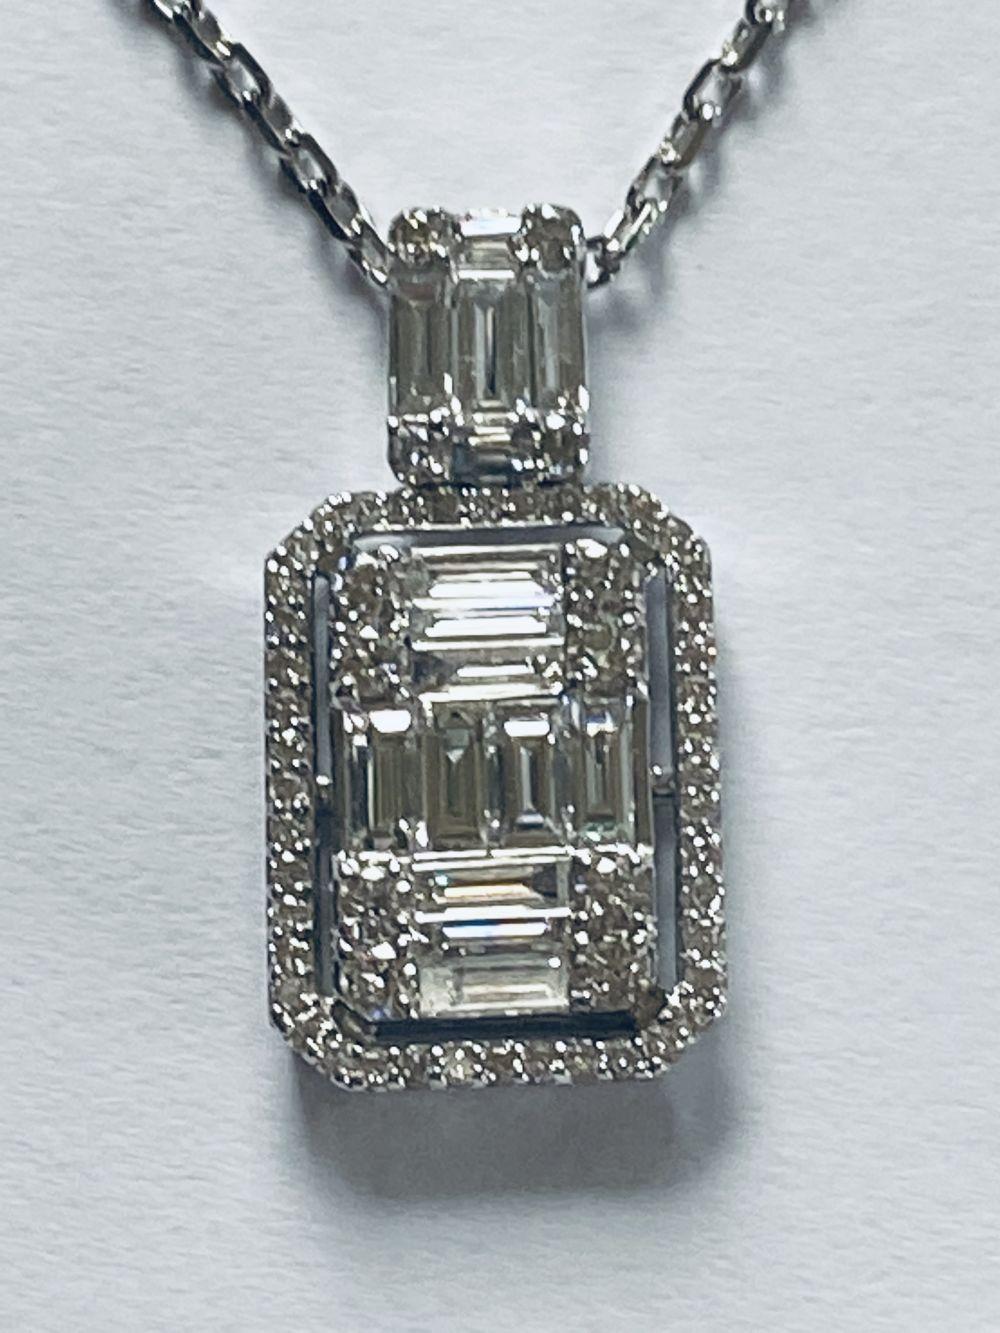 18CT WHITE GOLD DIAMOND BAGUETTE PENDANT - Image 2 of 3